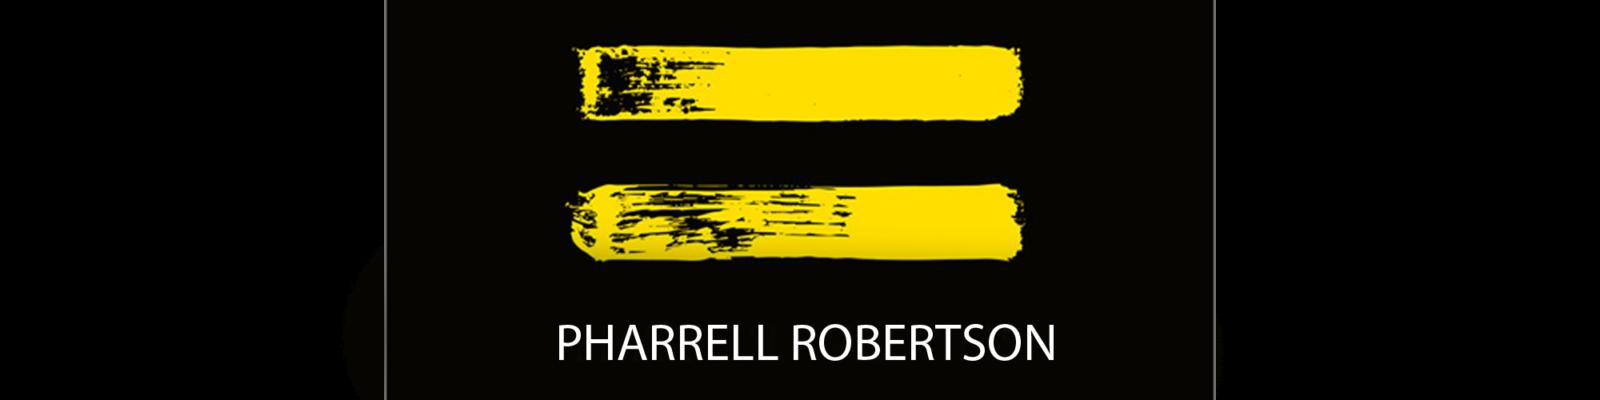 Pharell Robertson Pharell Robertson LOGOPHARRELL 1600x400